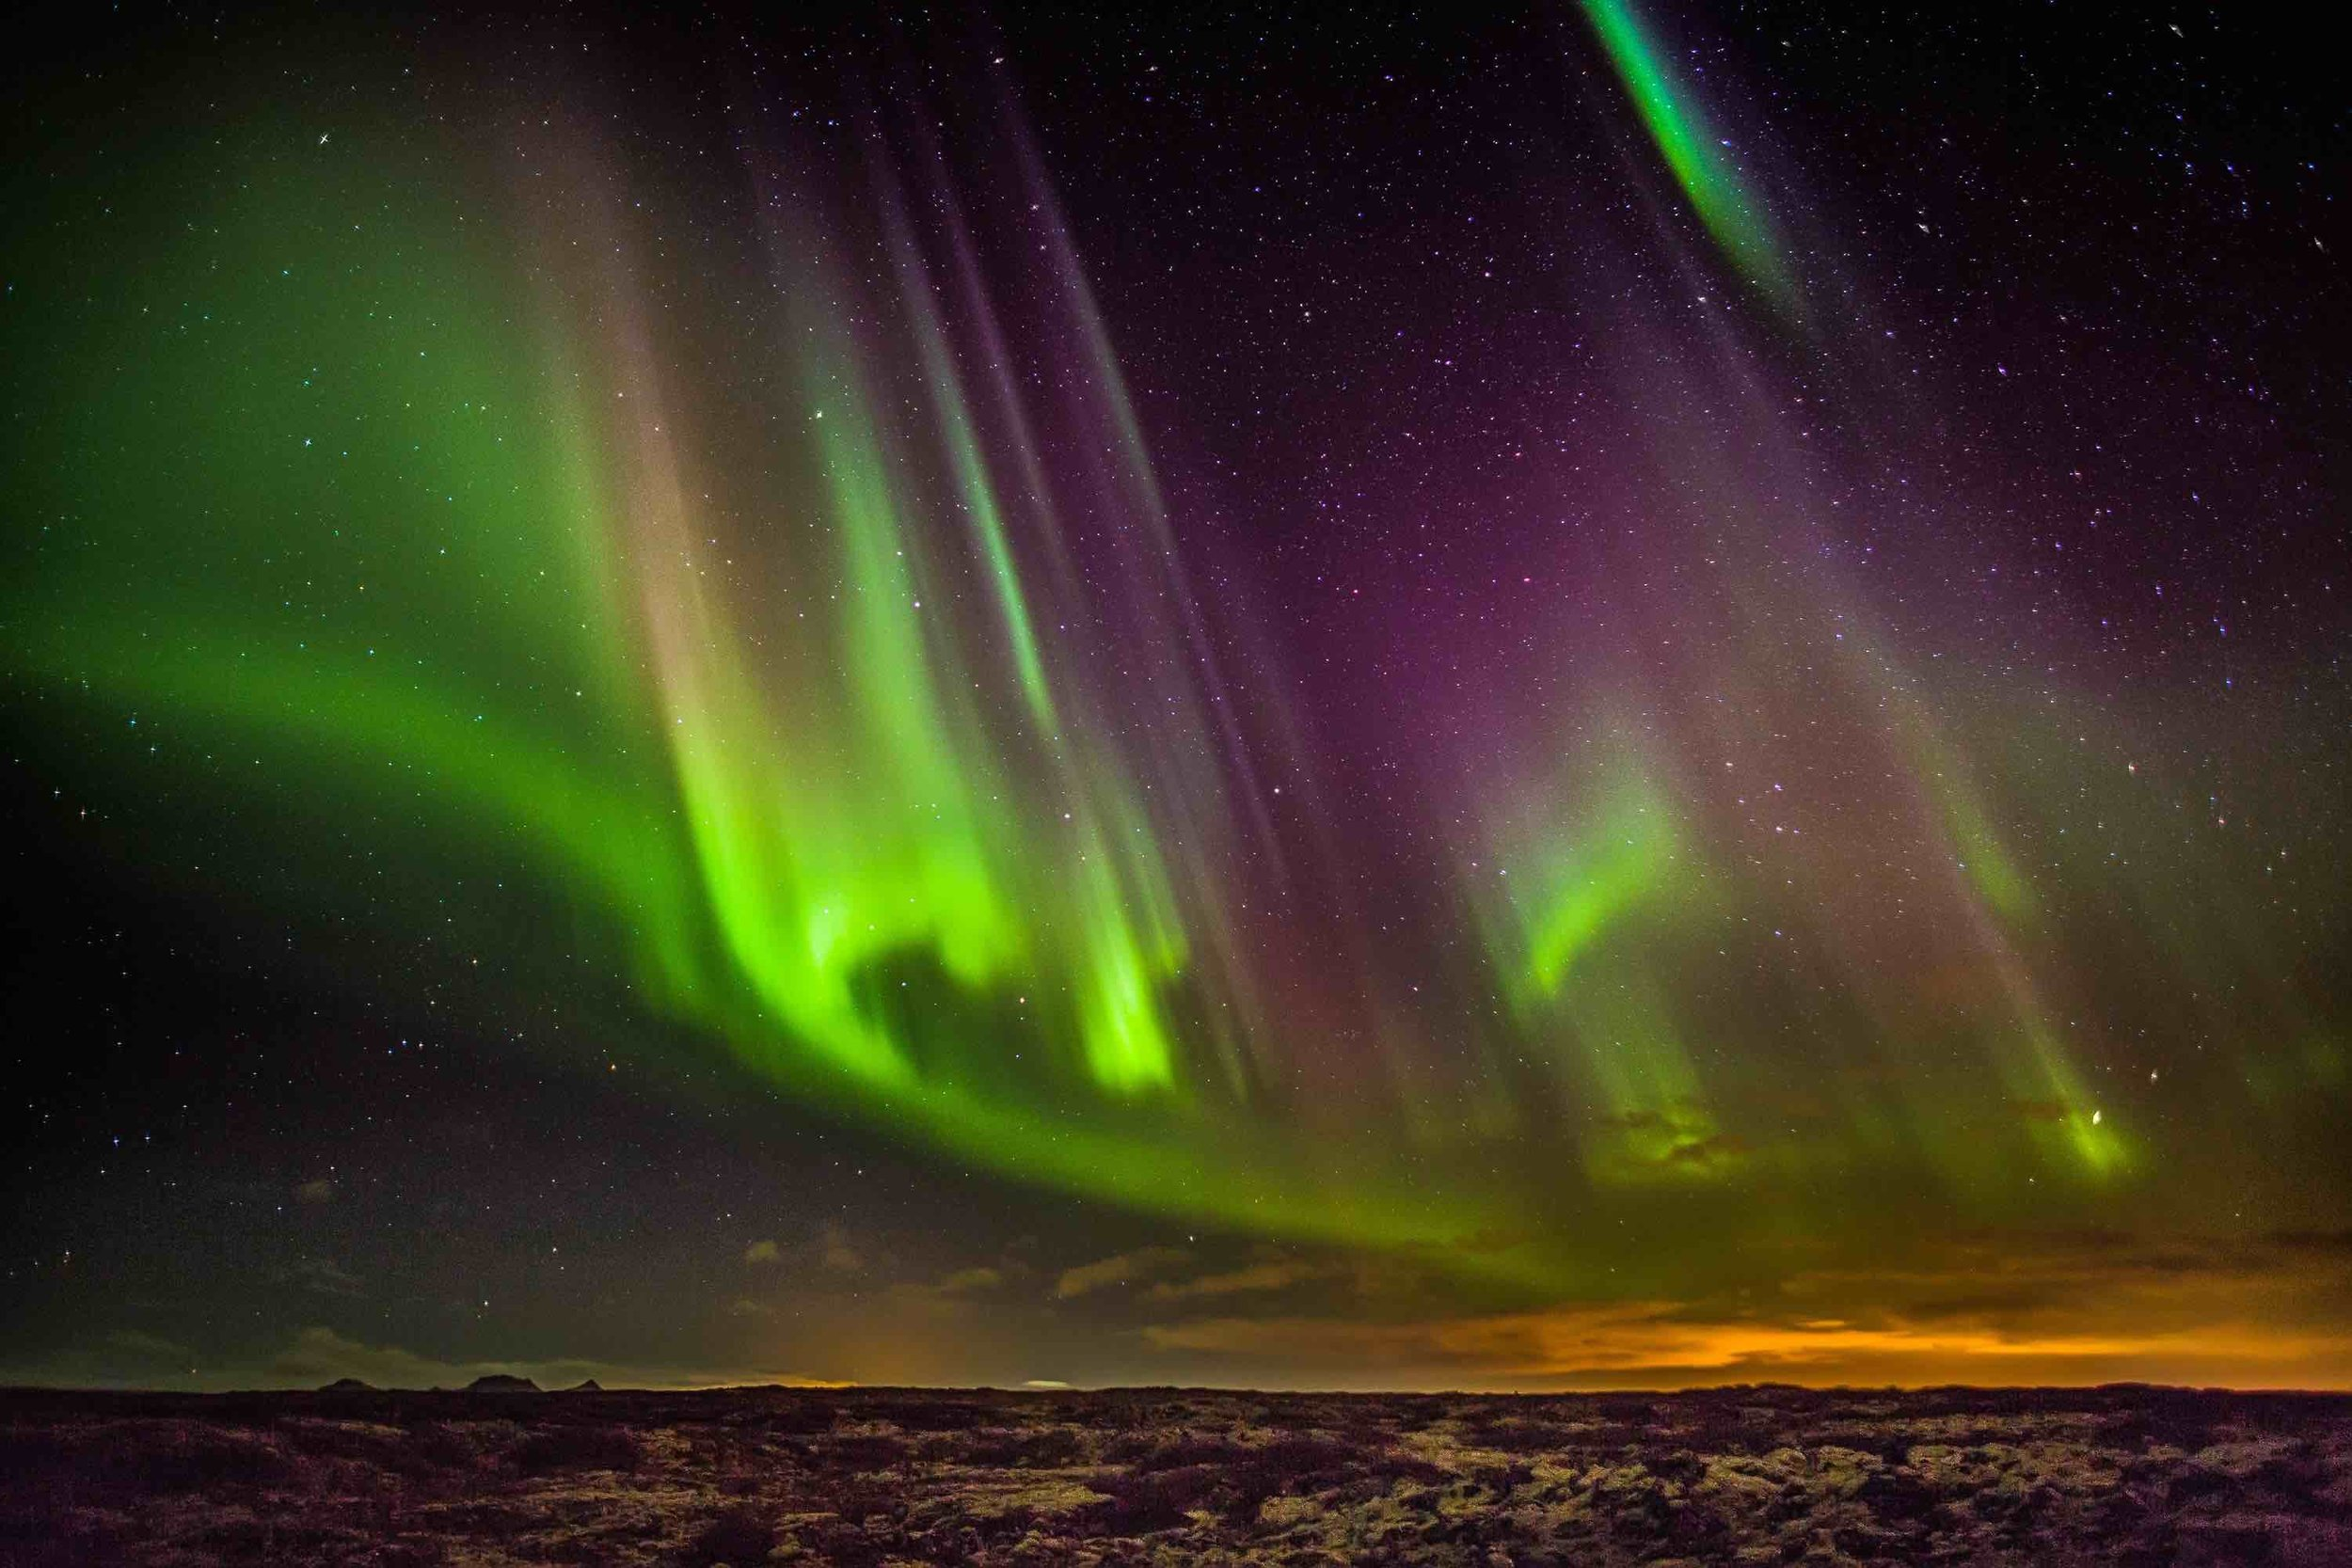 10/Northern lights